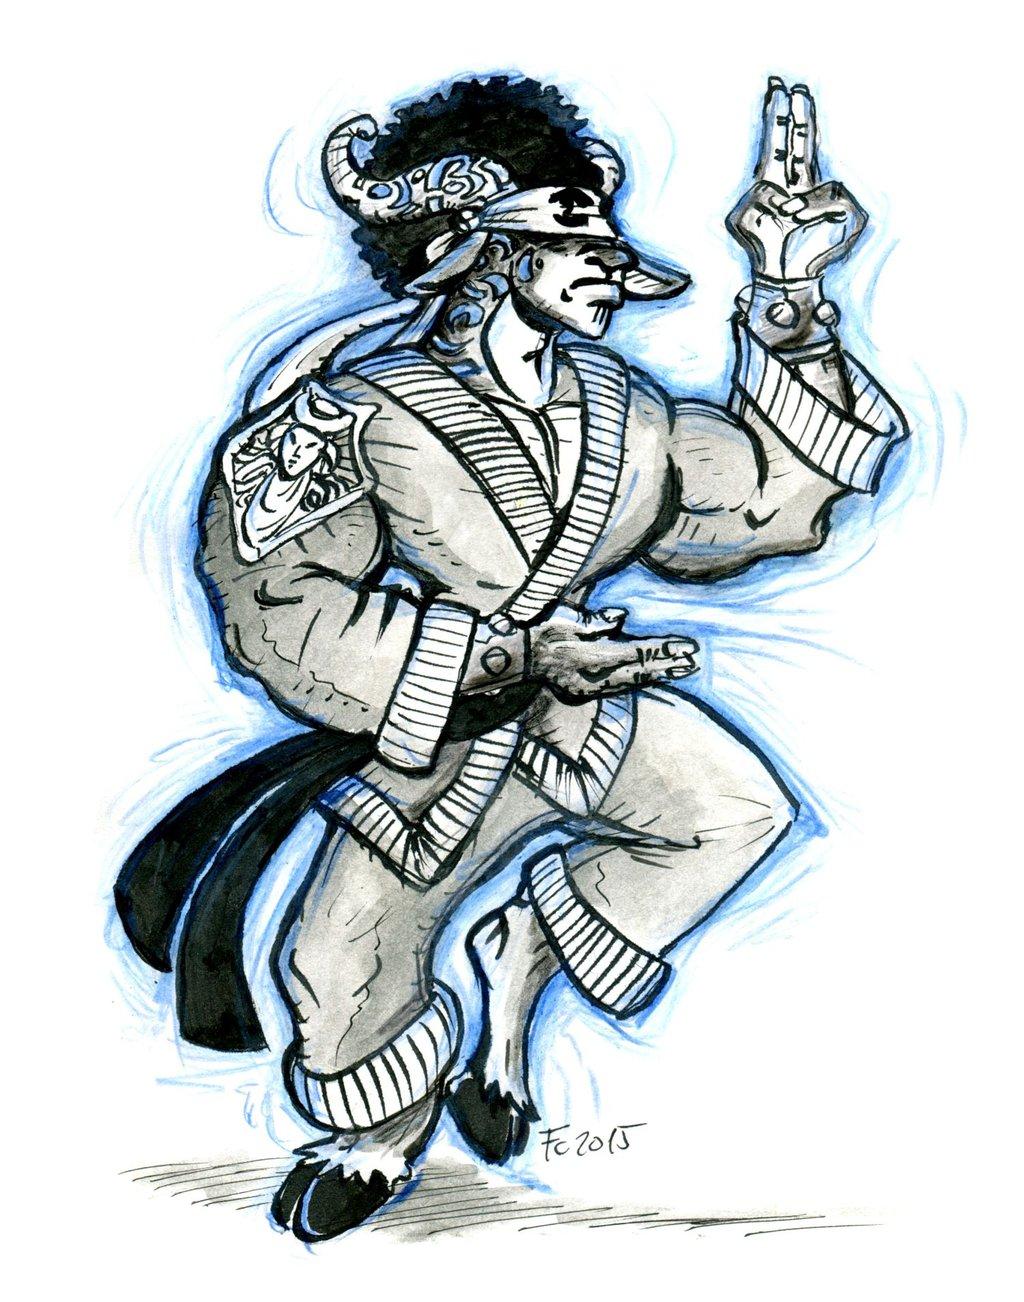 "clone-artist minotaur ""Ringo the Minotaur Monk"", pg fated - by clone-artist (Filip C.) clone-artist.deviantart.com (2015-08) © dell'autore tutti i diritti riservati"